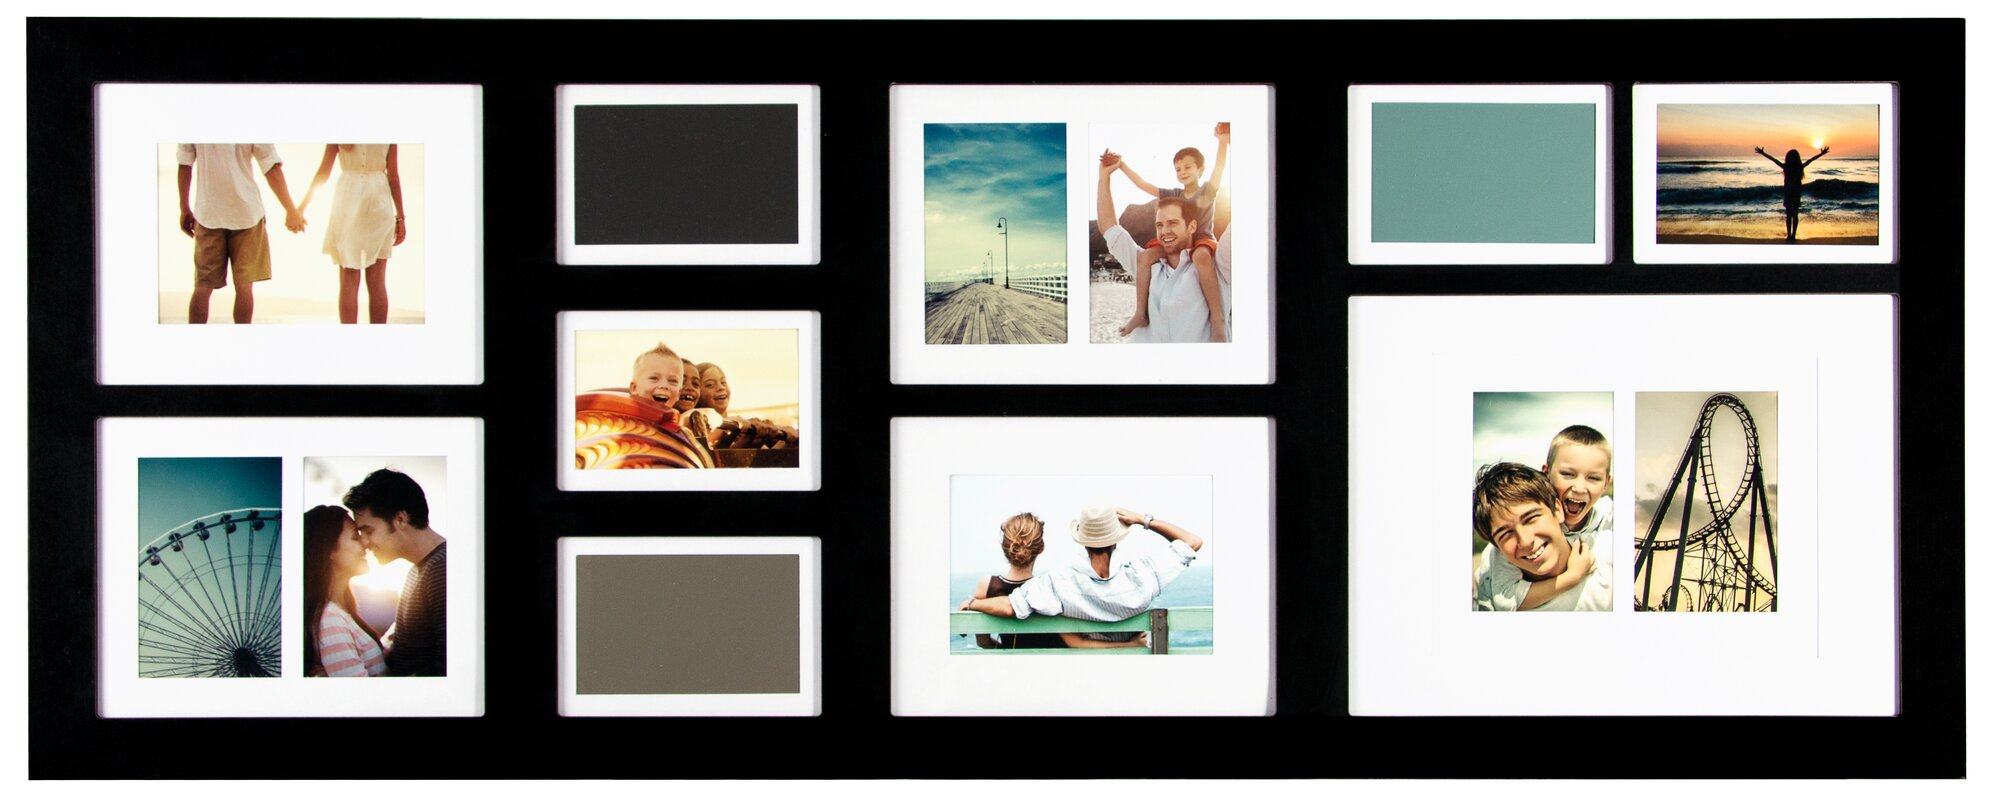 Nielsenbainbridge pinnacle 10 opening collage picture frame pinnacle 10 opening collage picture frame jeuxipadfo Choice Image